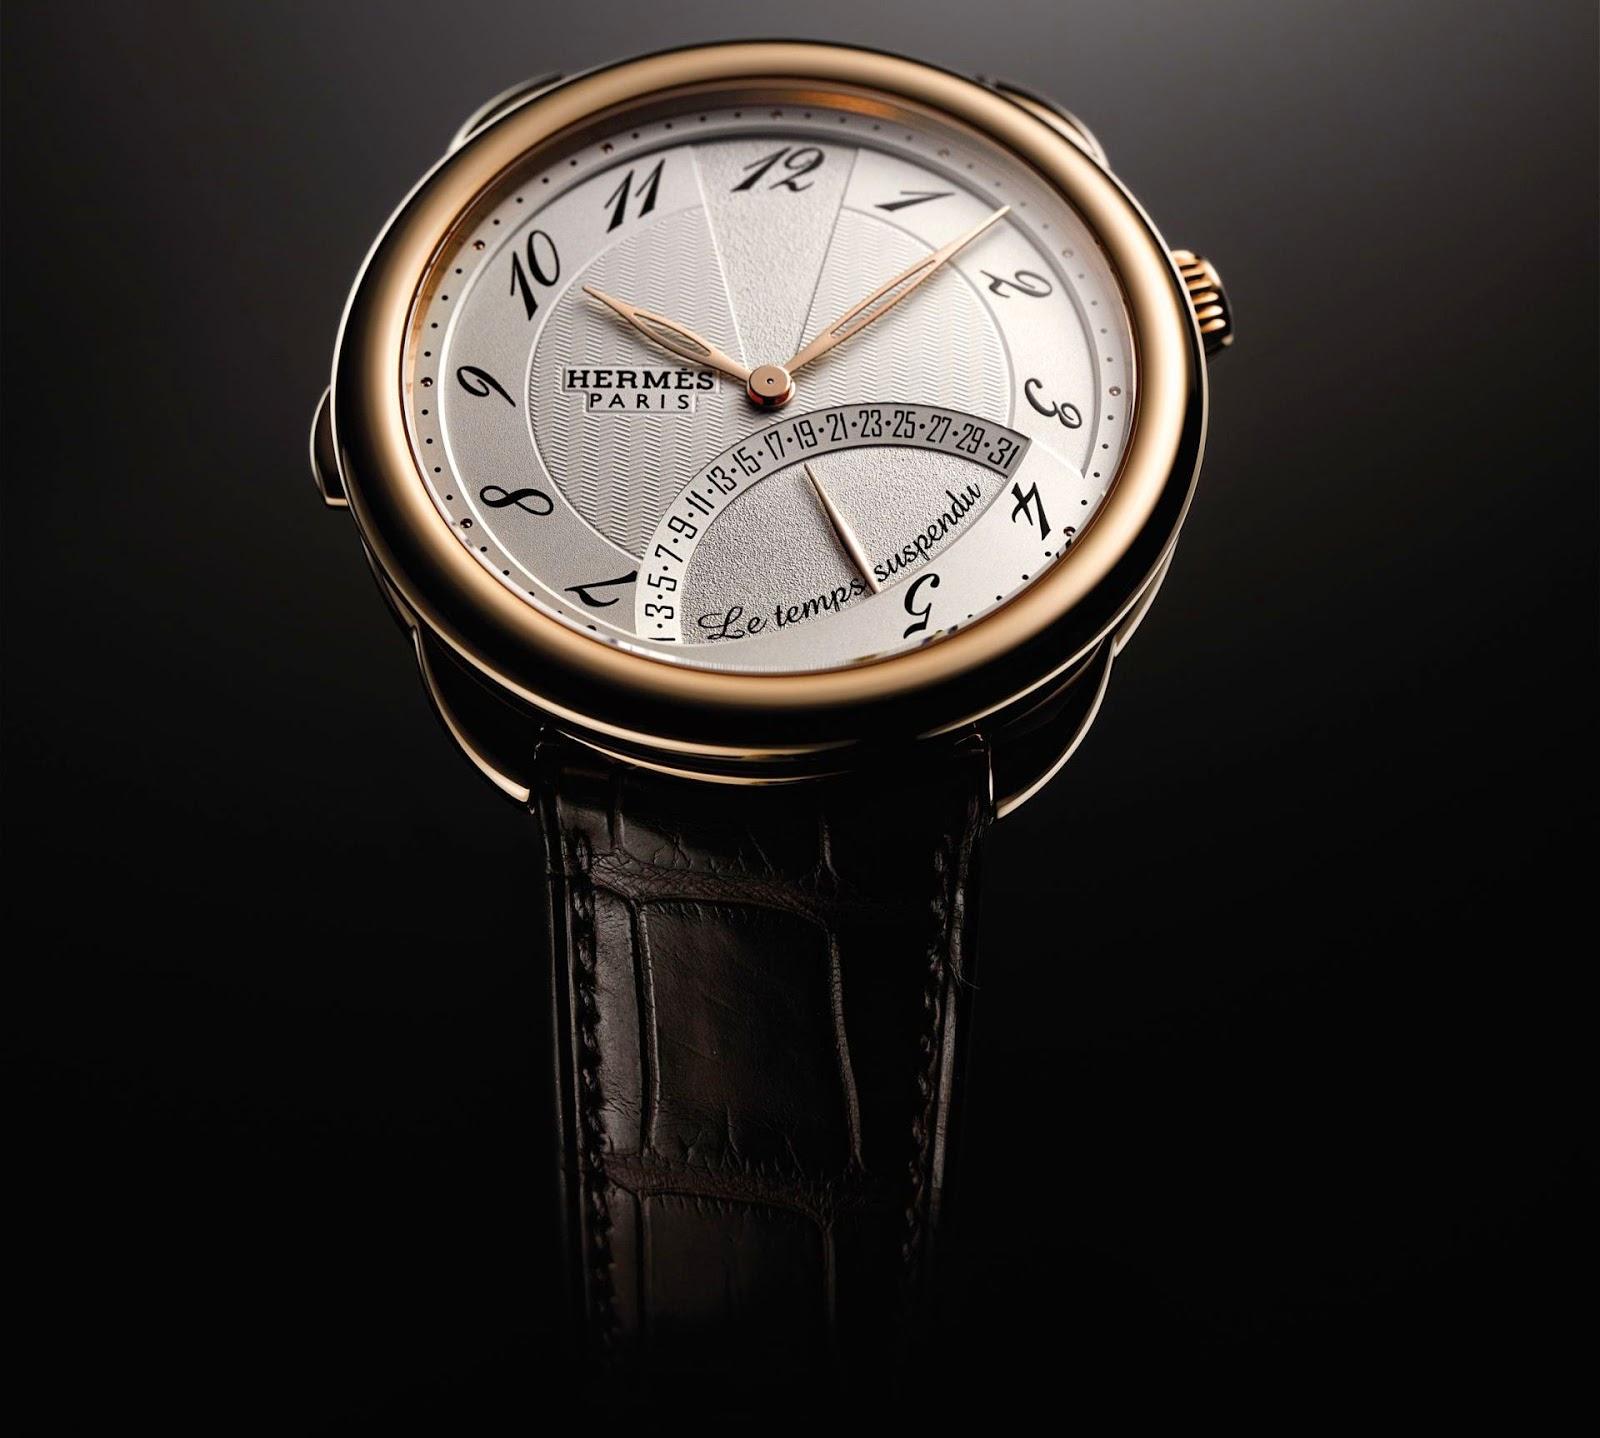 Hermès Arceau Le temps Suspendu Rose Gold watch 43mm model retrograde date